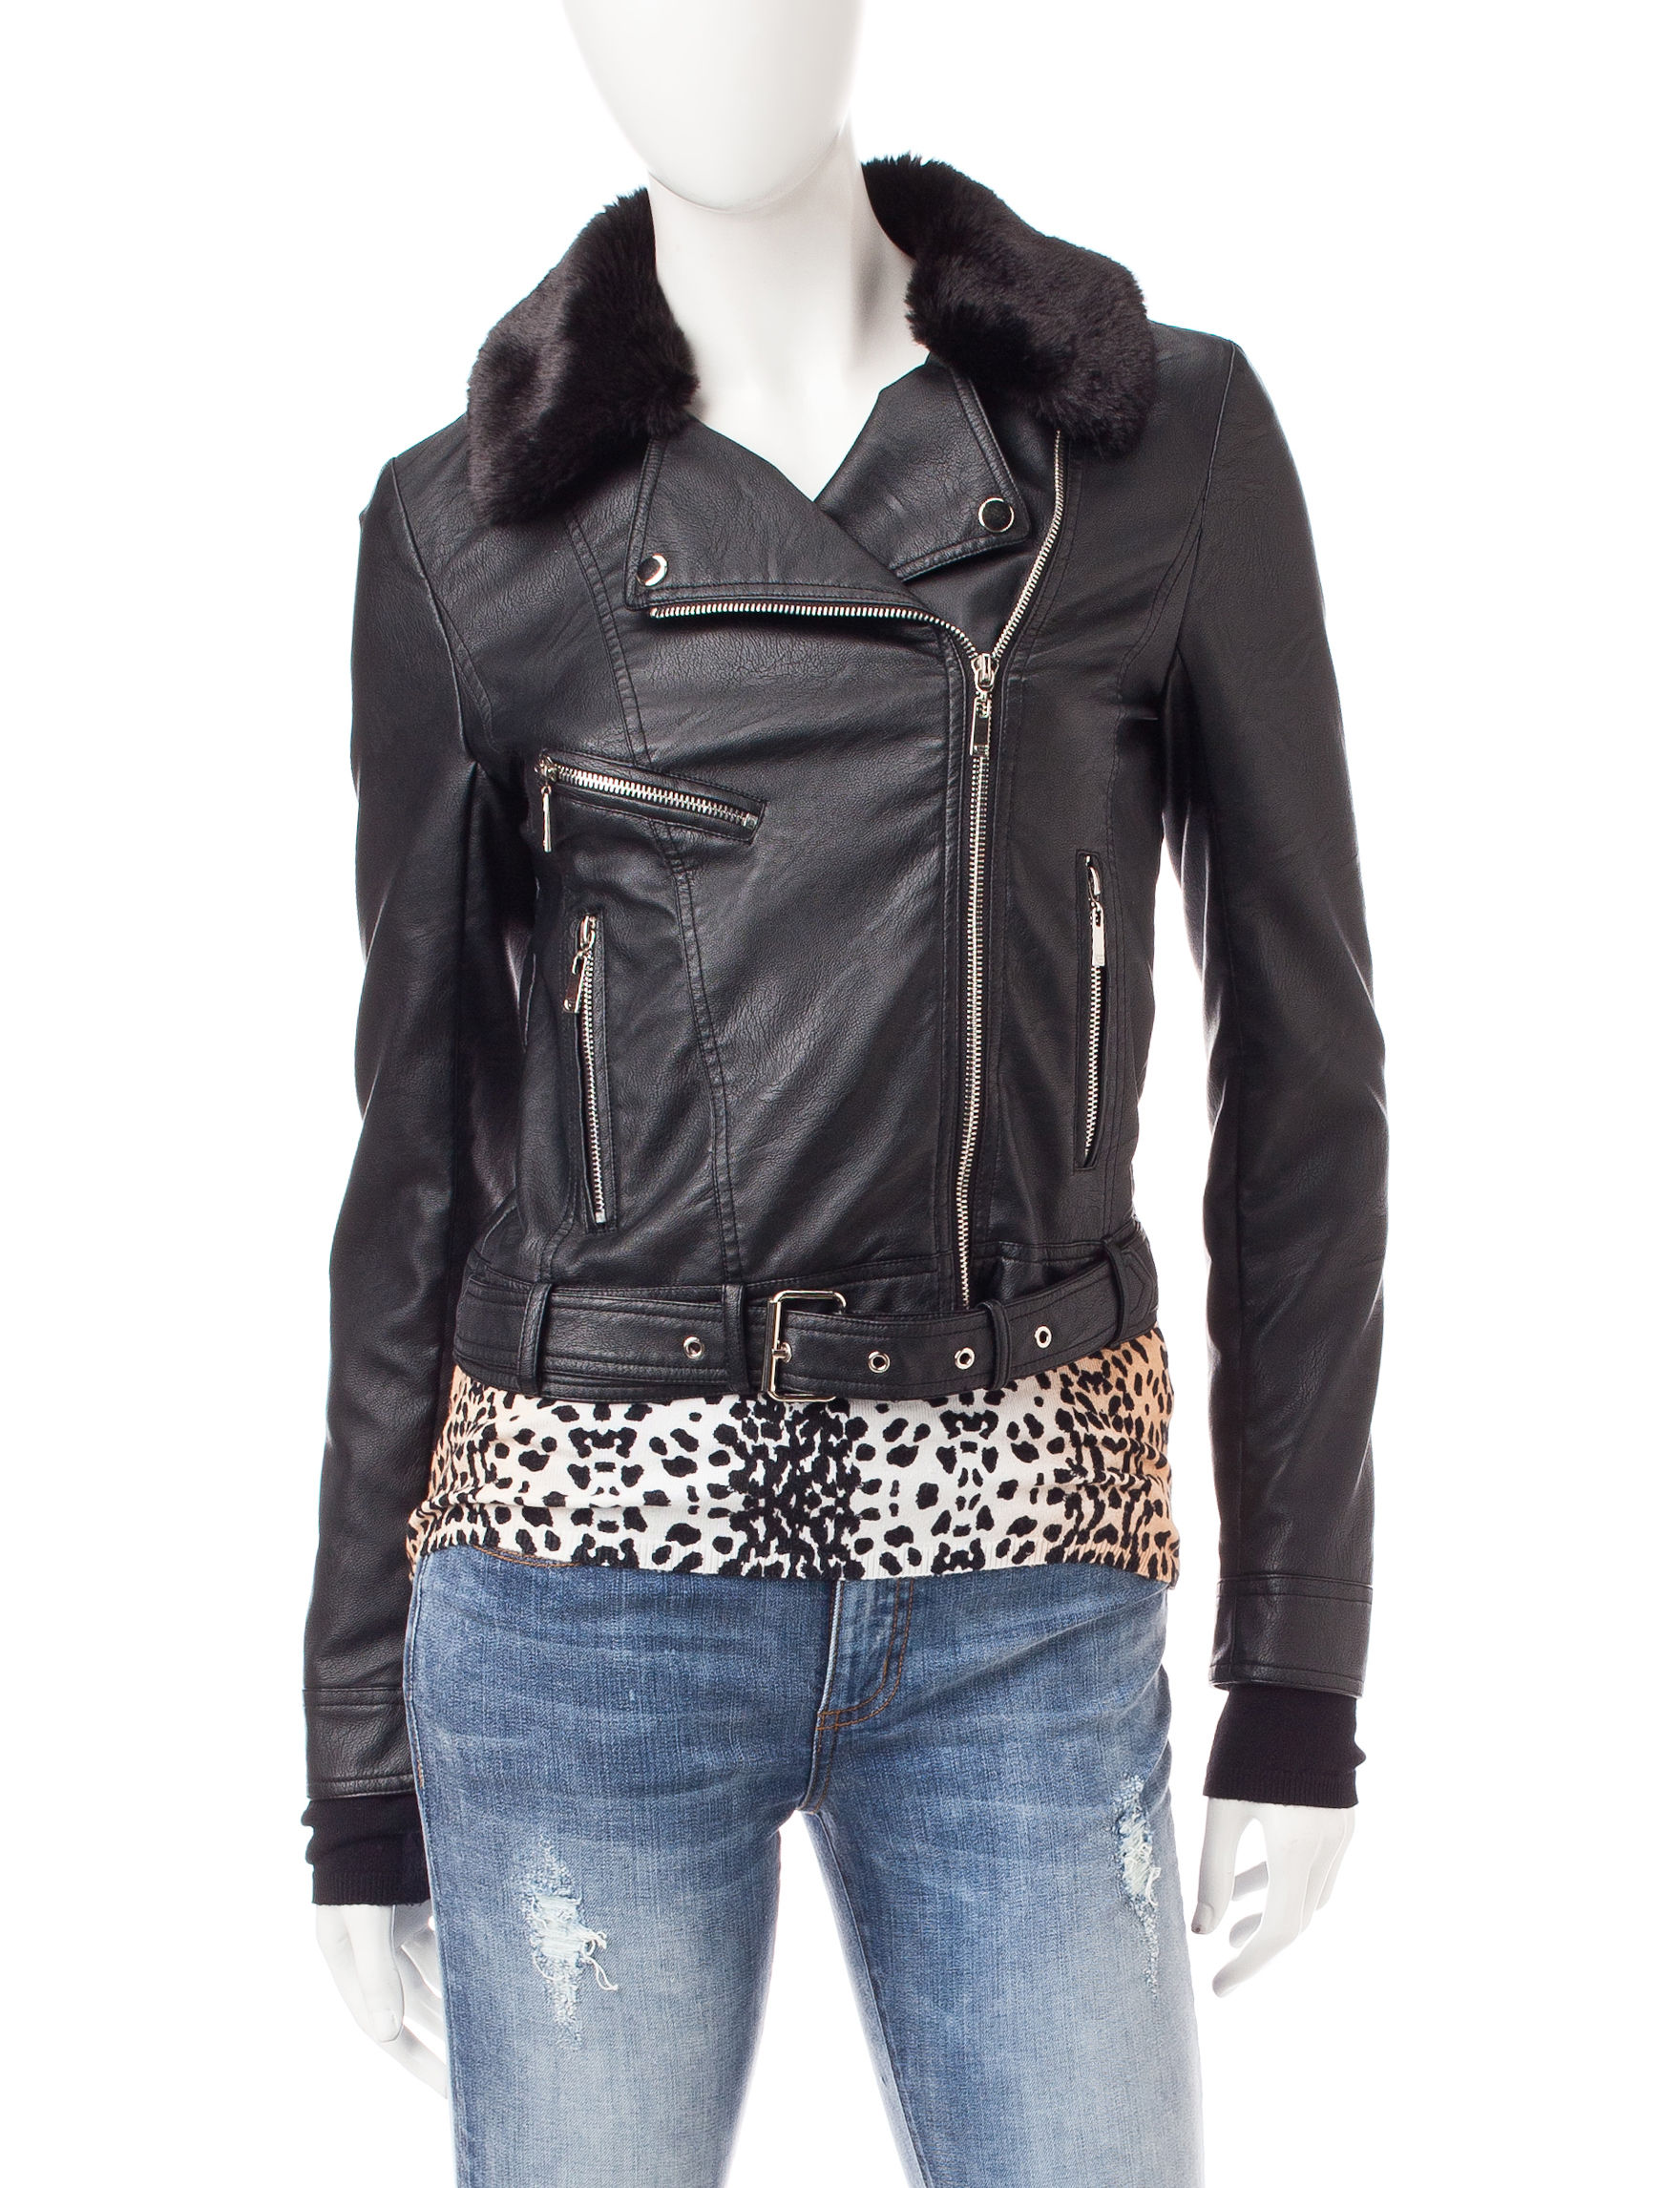 Buffalo Blu Black Everyday & Casual Lightweight Jackets & Blazers